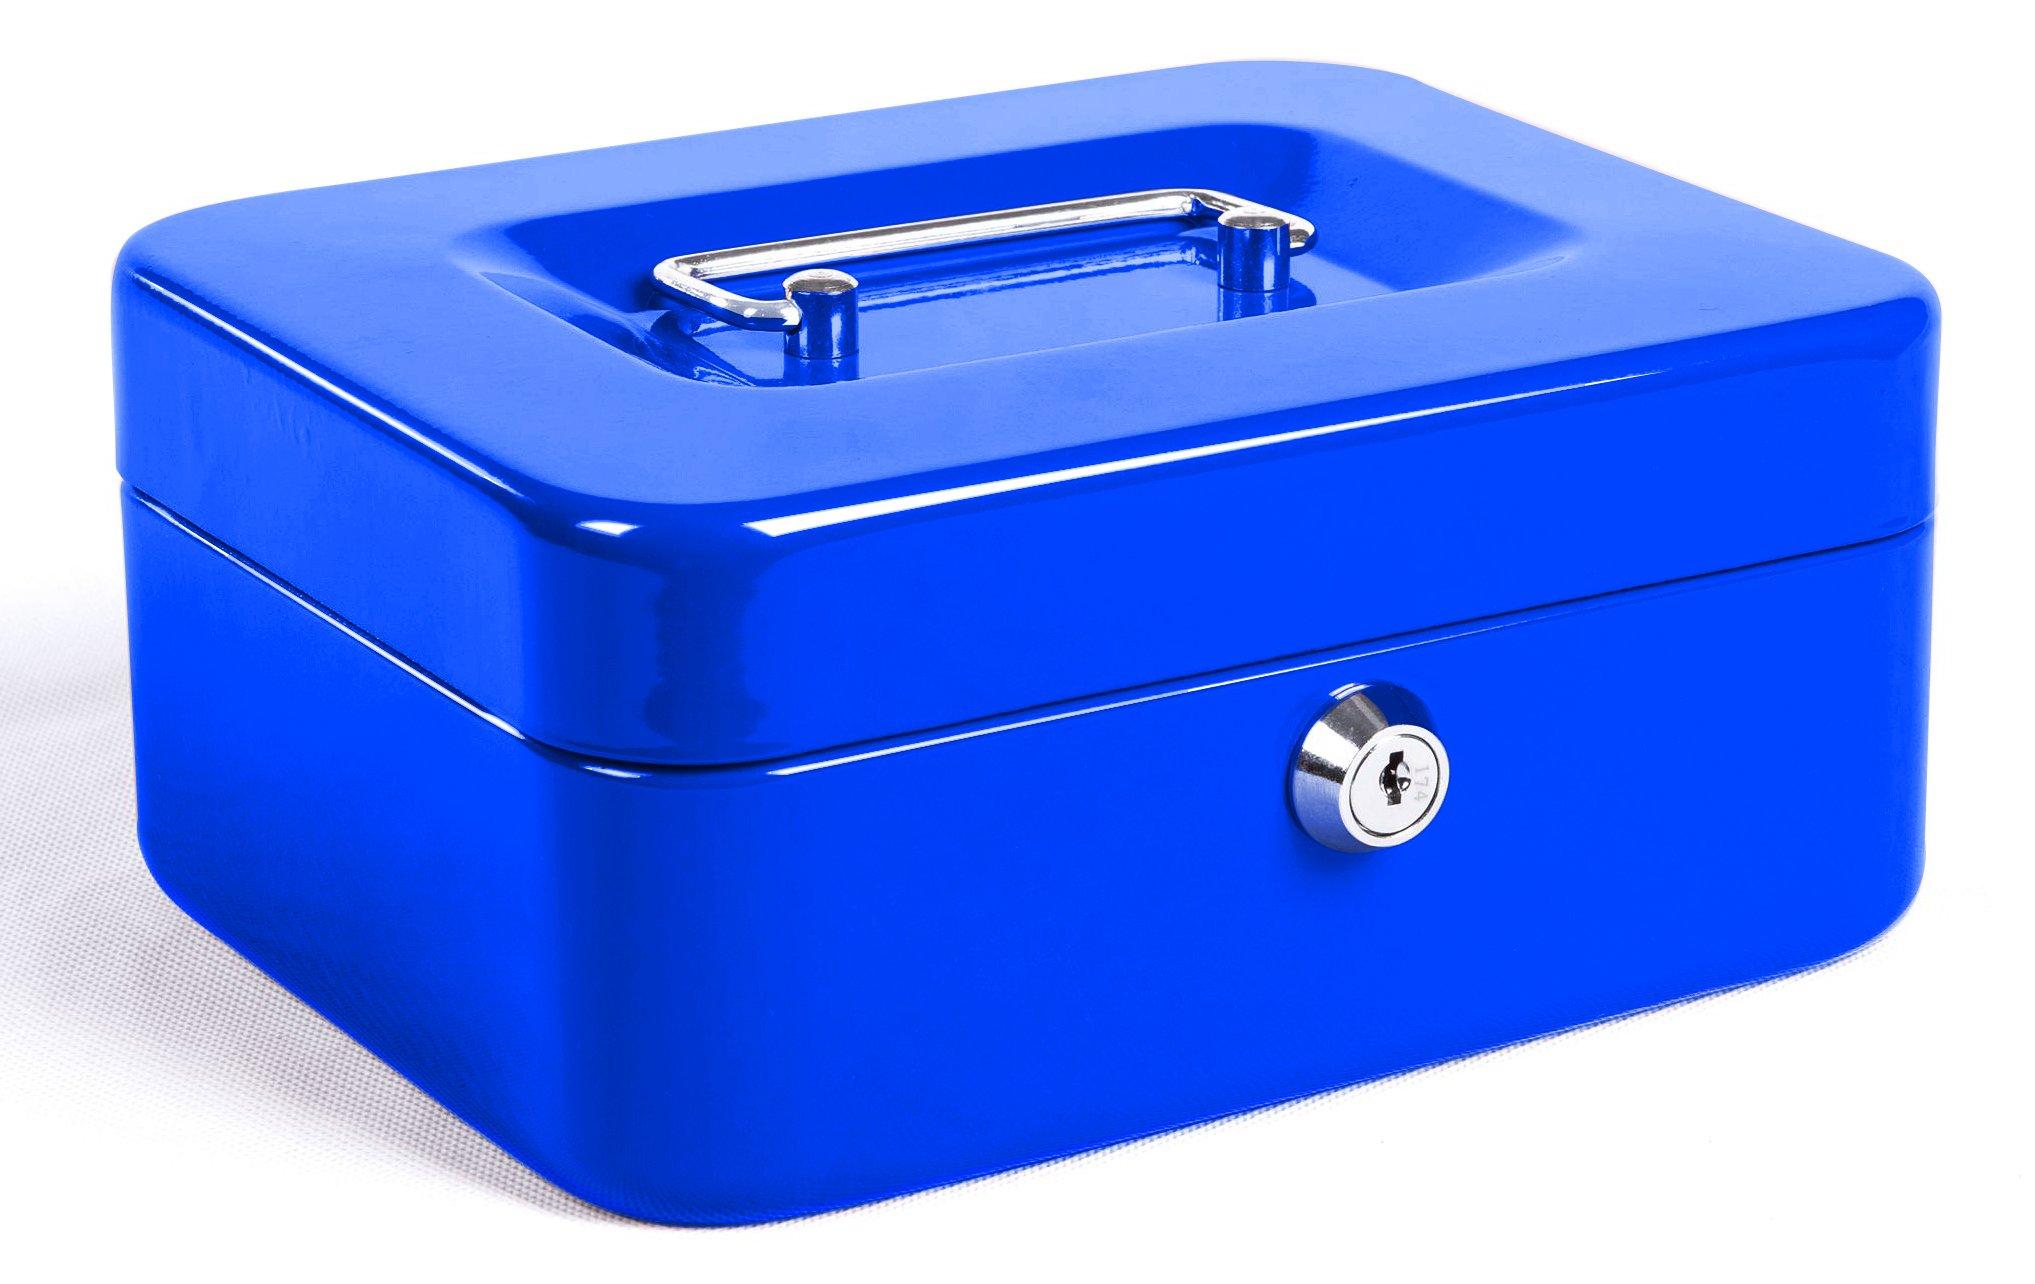 Jssmst Locking Small Steel Cash Box with Money Tray,Lock Box,Blue